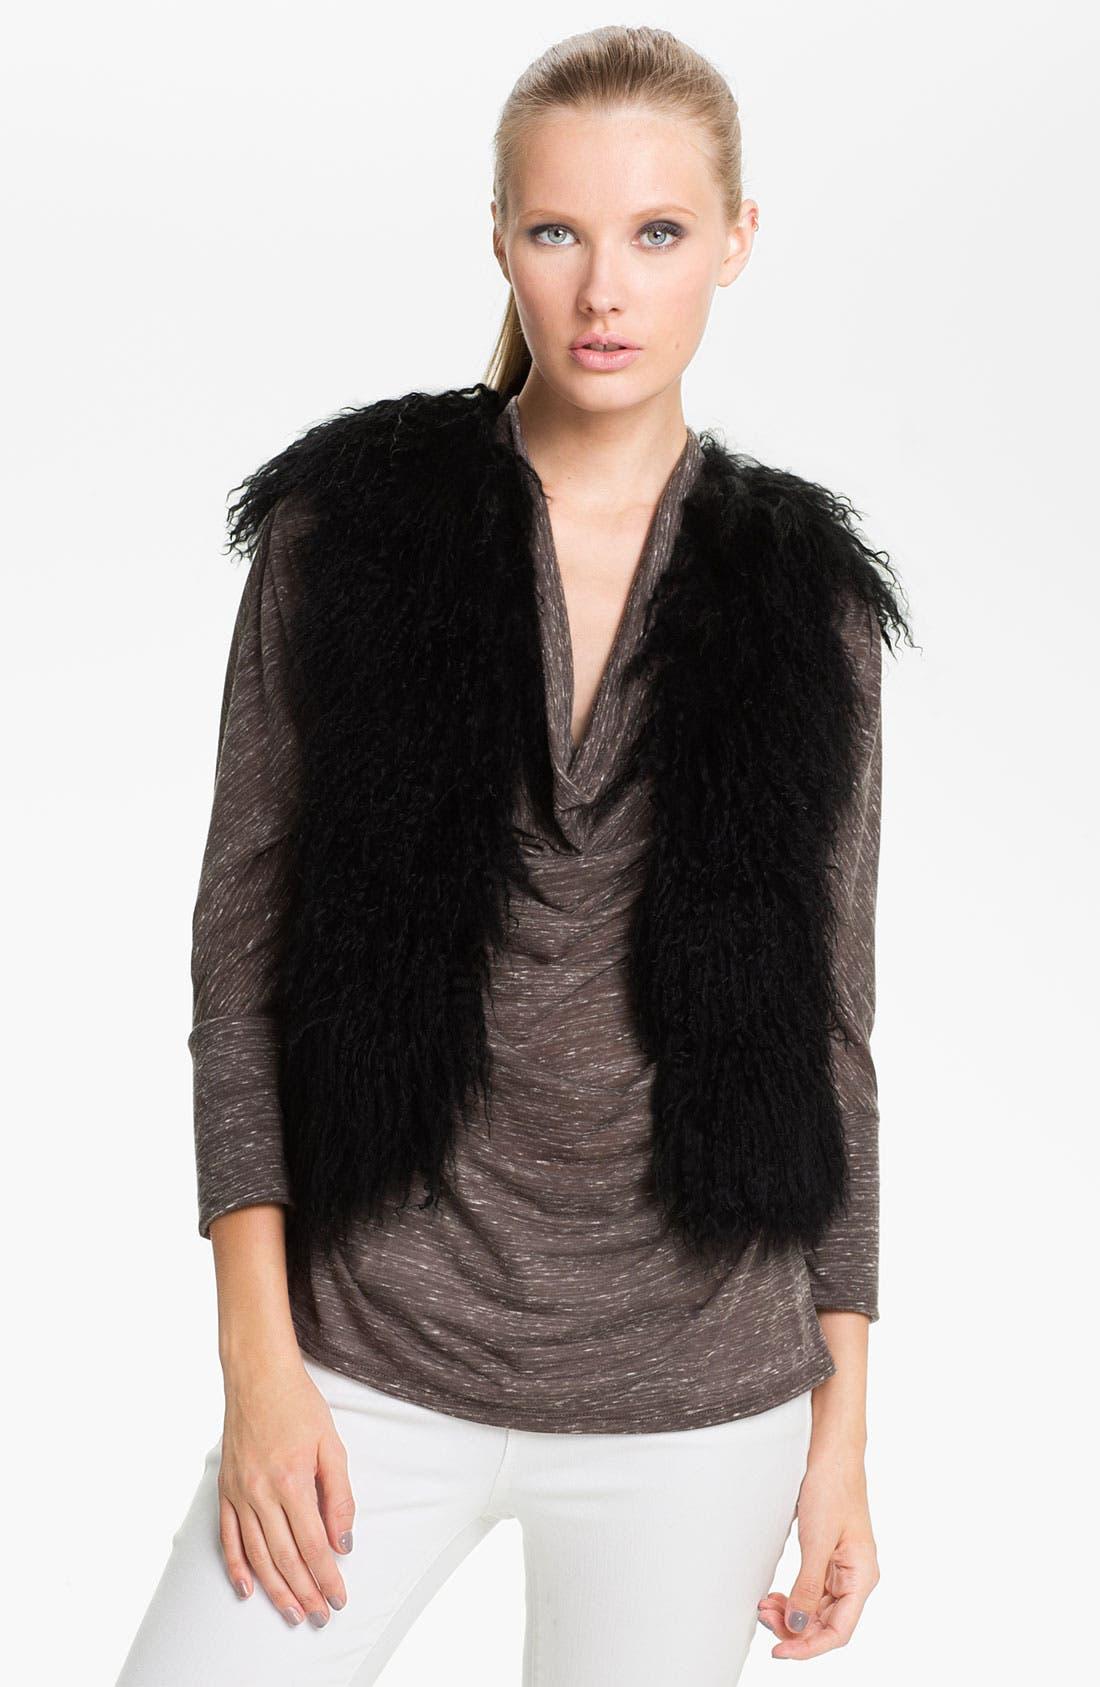 Main Image - Jessica Wilde Genuine Tibetan Lamb Fur & Knit Vest